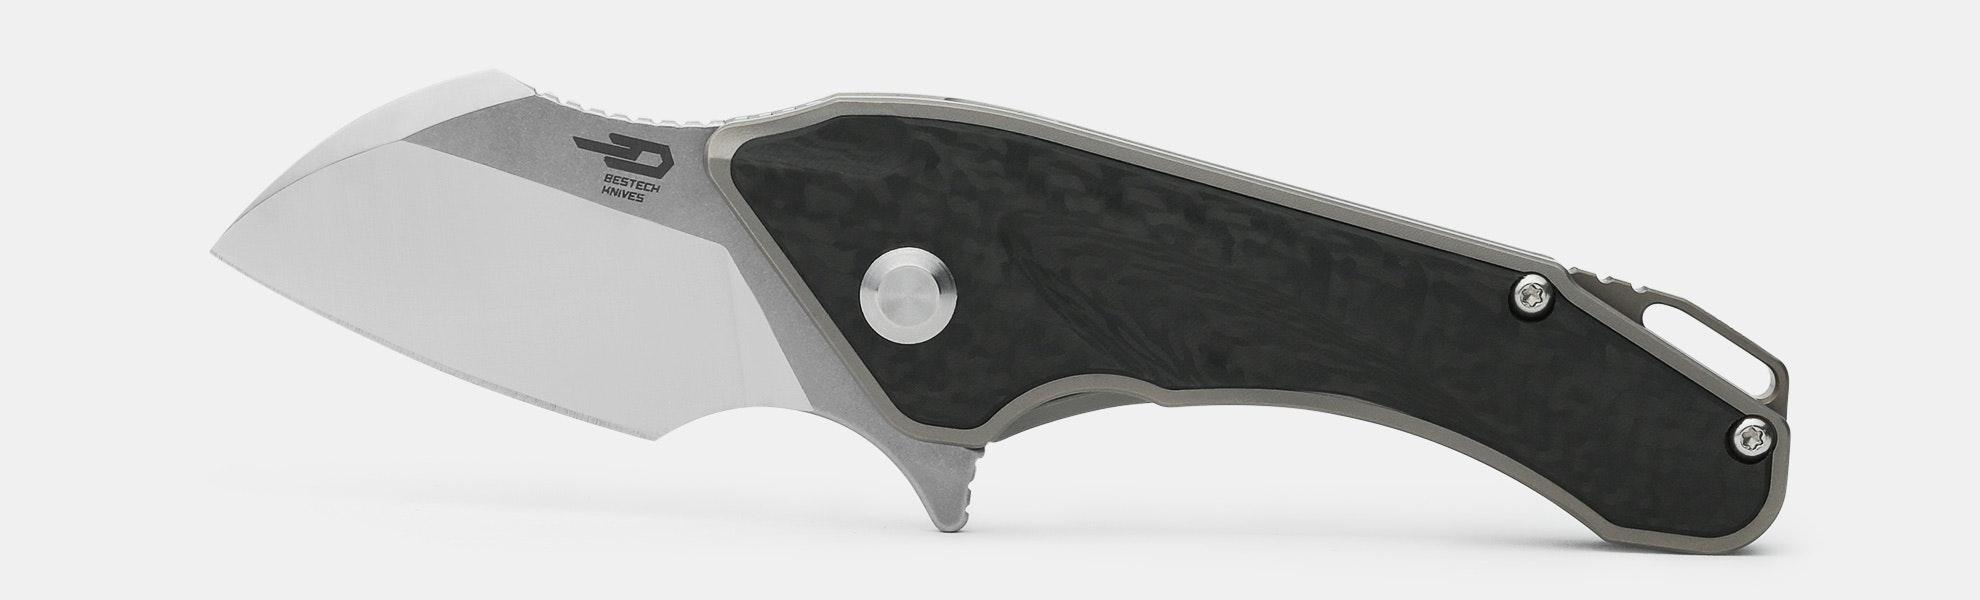 Bestech 1710 IMP Titanium Frame Lock Knife